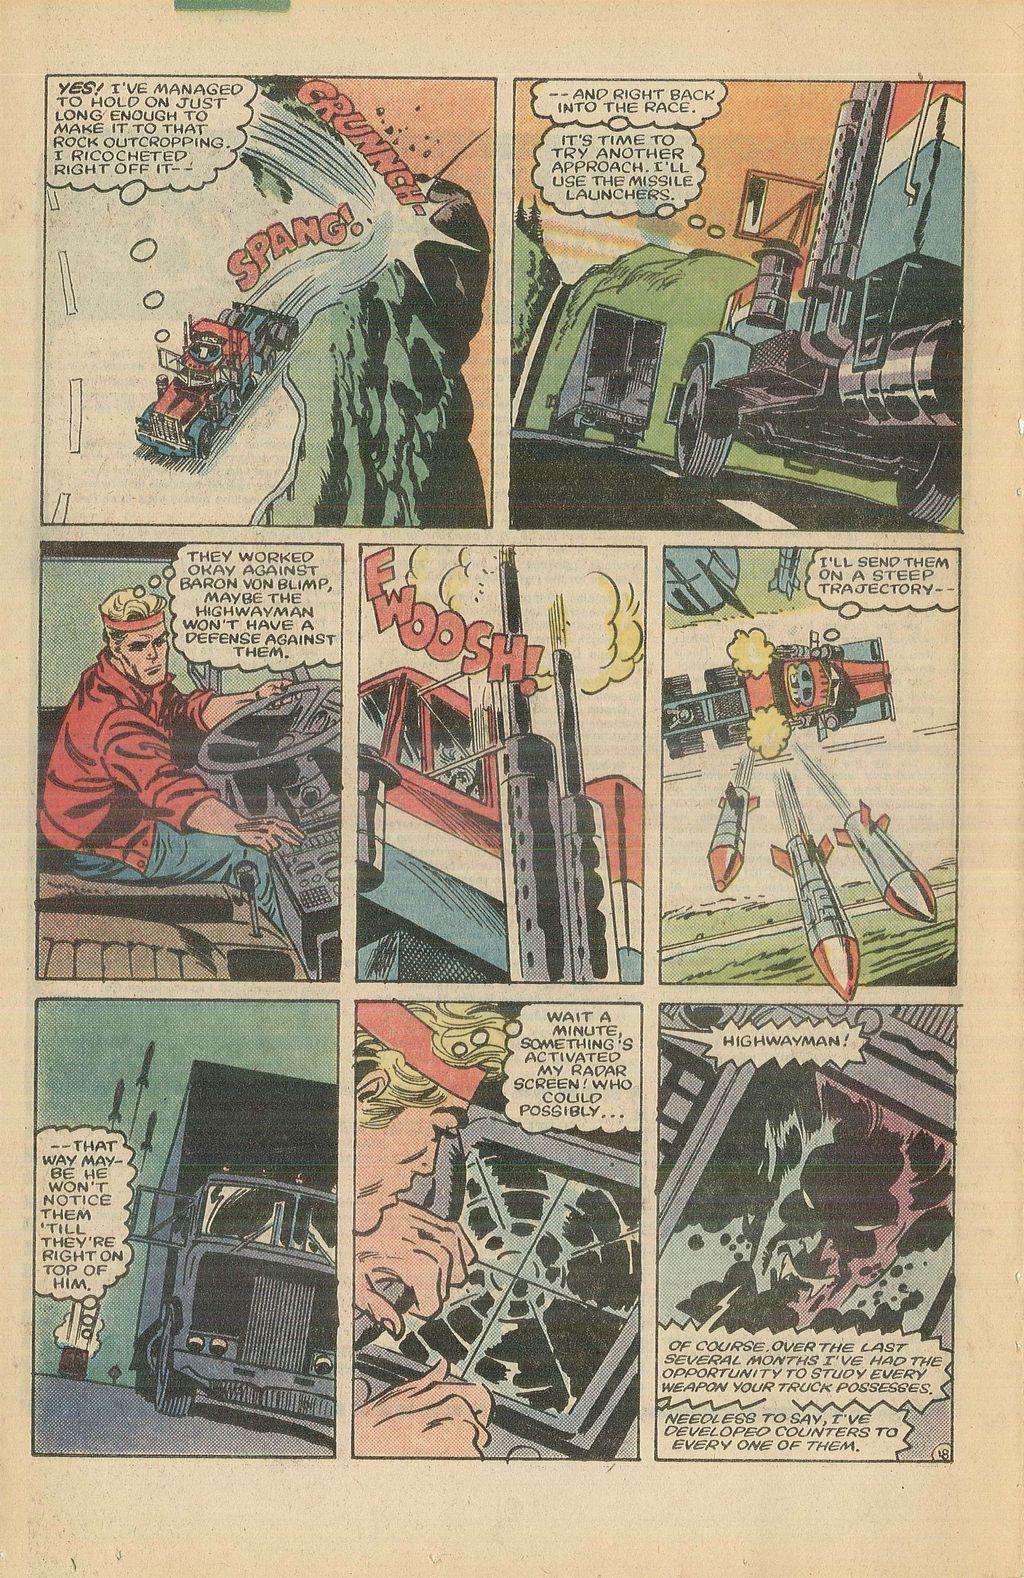 Read online U.S. 1 comic -  Issue #10 - 26